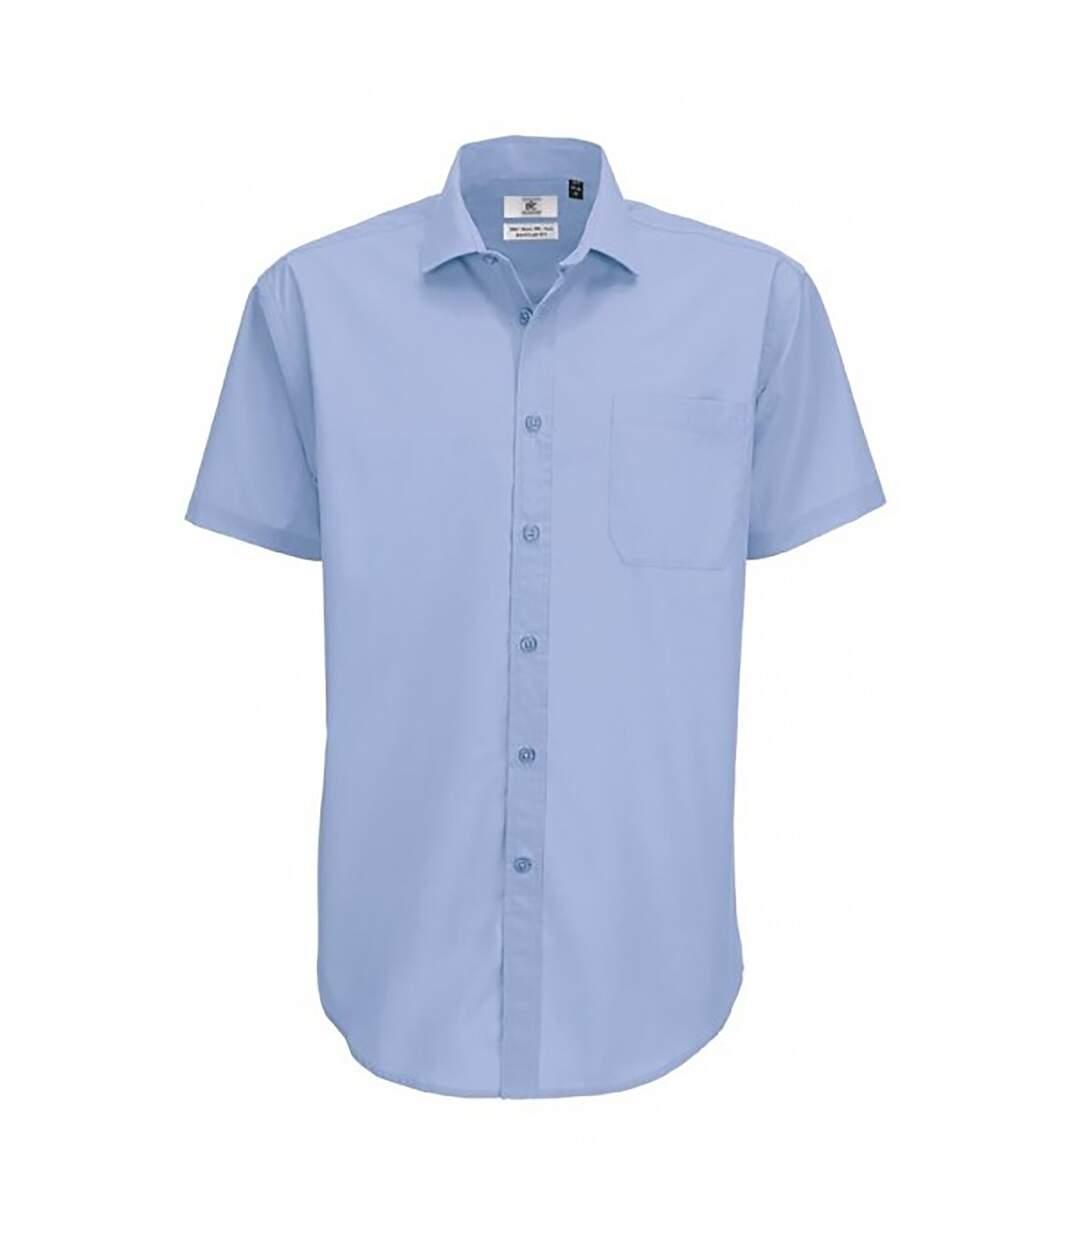 B&C Mens Smart Short Sleeve Shirt / Mens Shirts (Black) - UTBC112